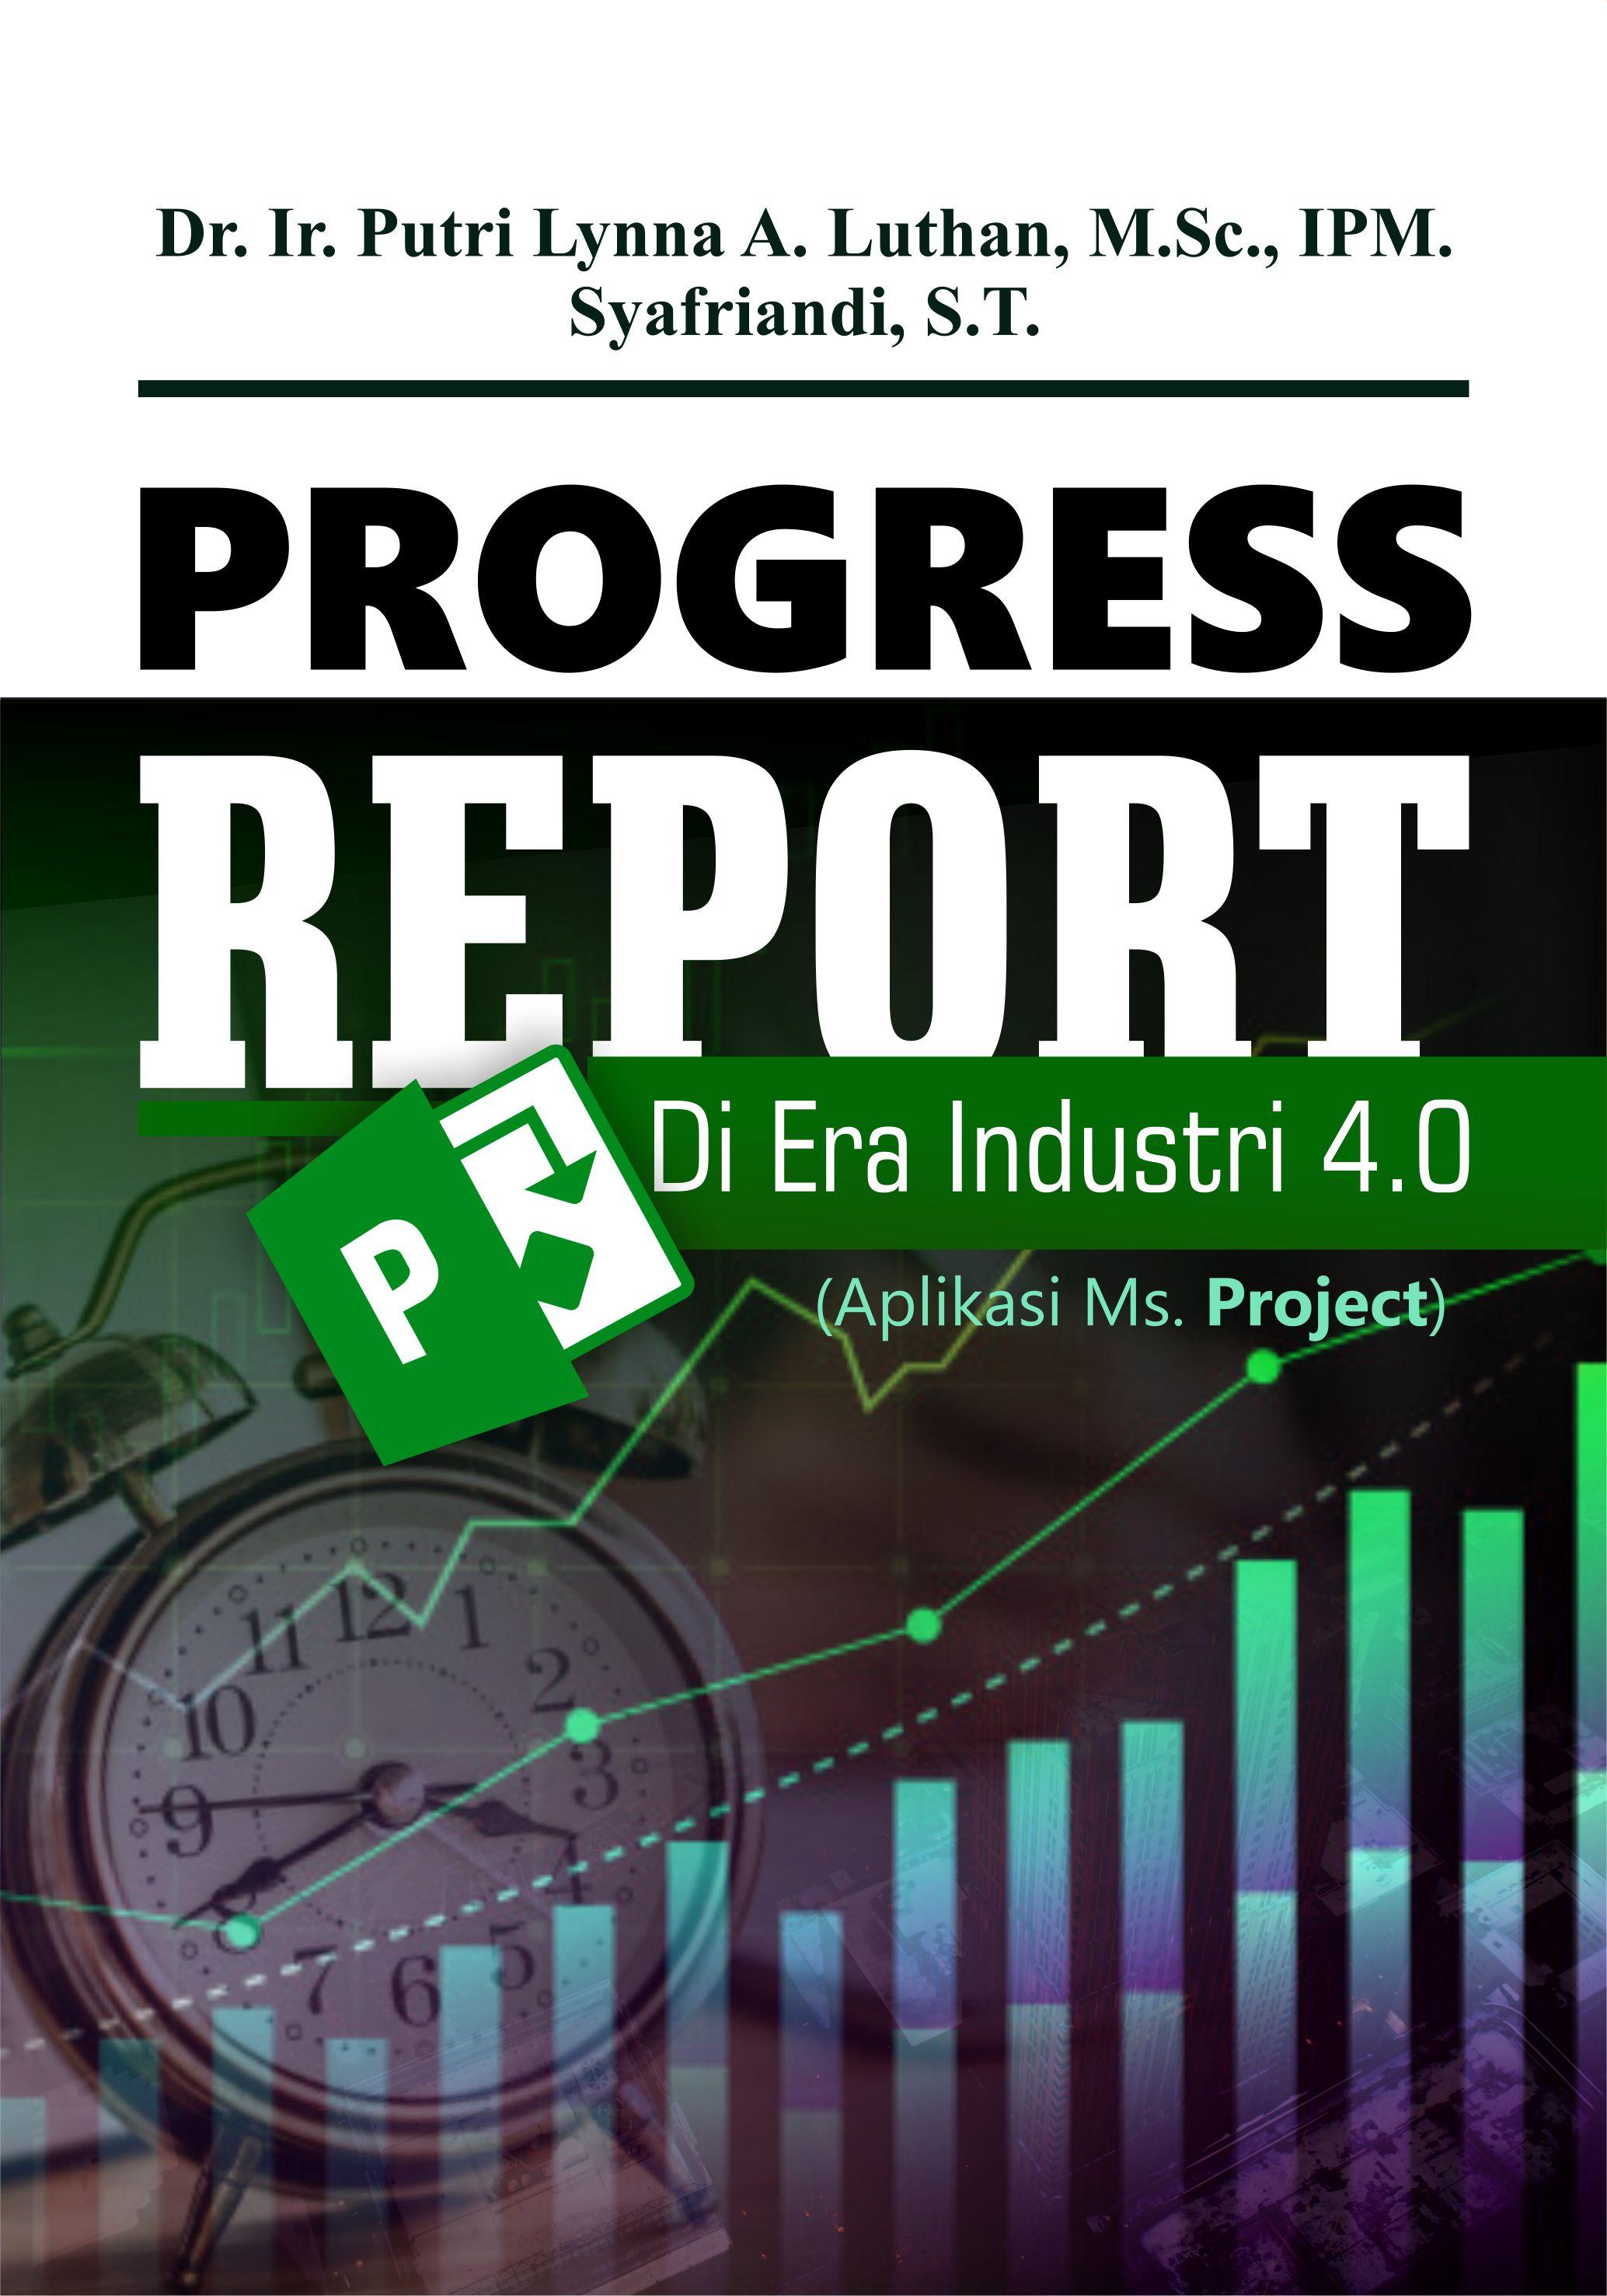 Progress report di era industri 4.0: aplikasi MS. Project [sumber elektronis]